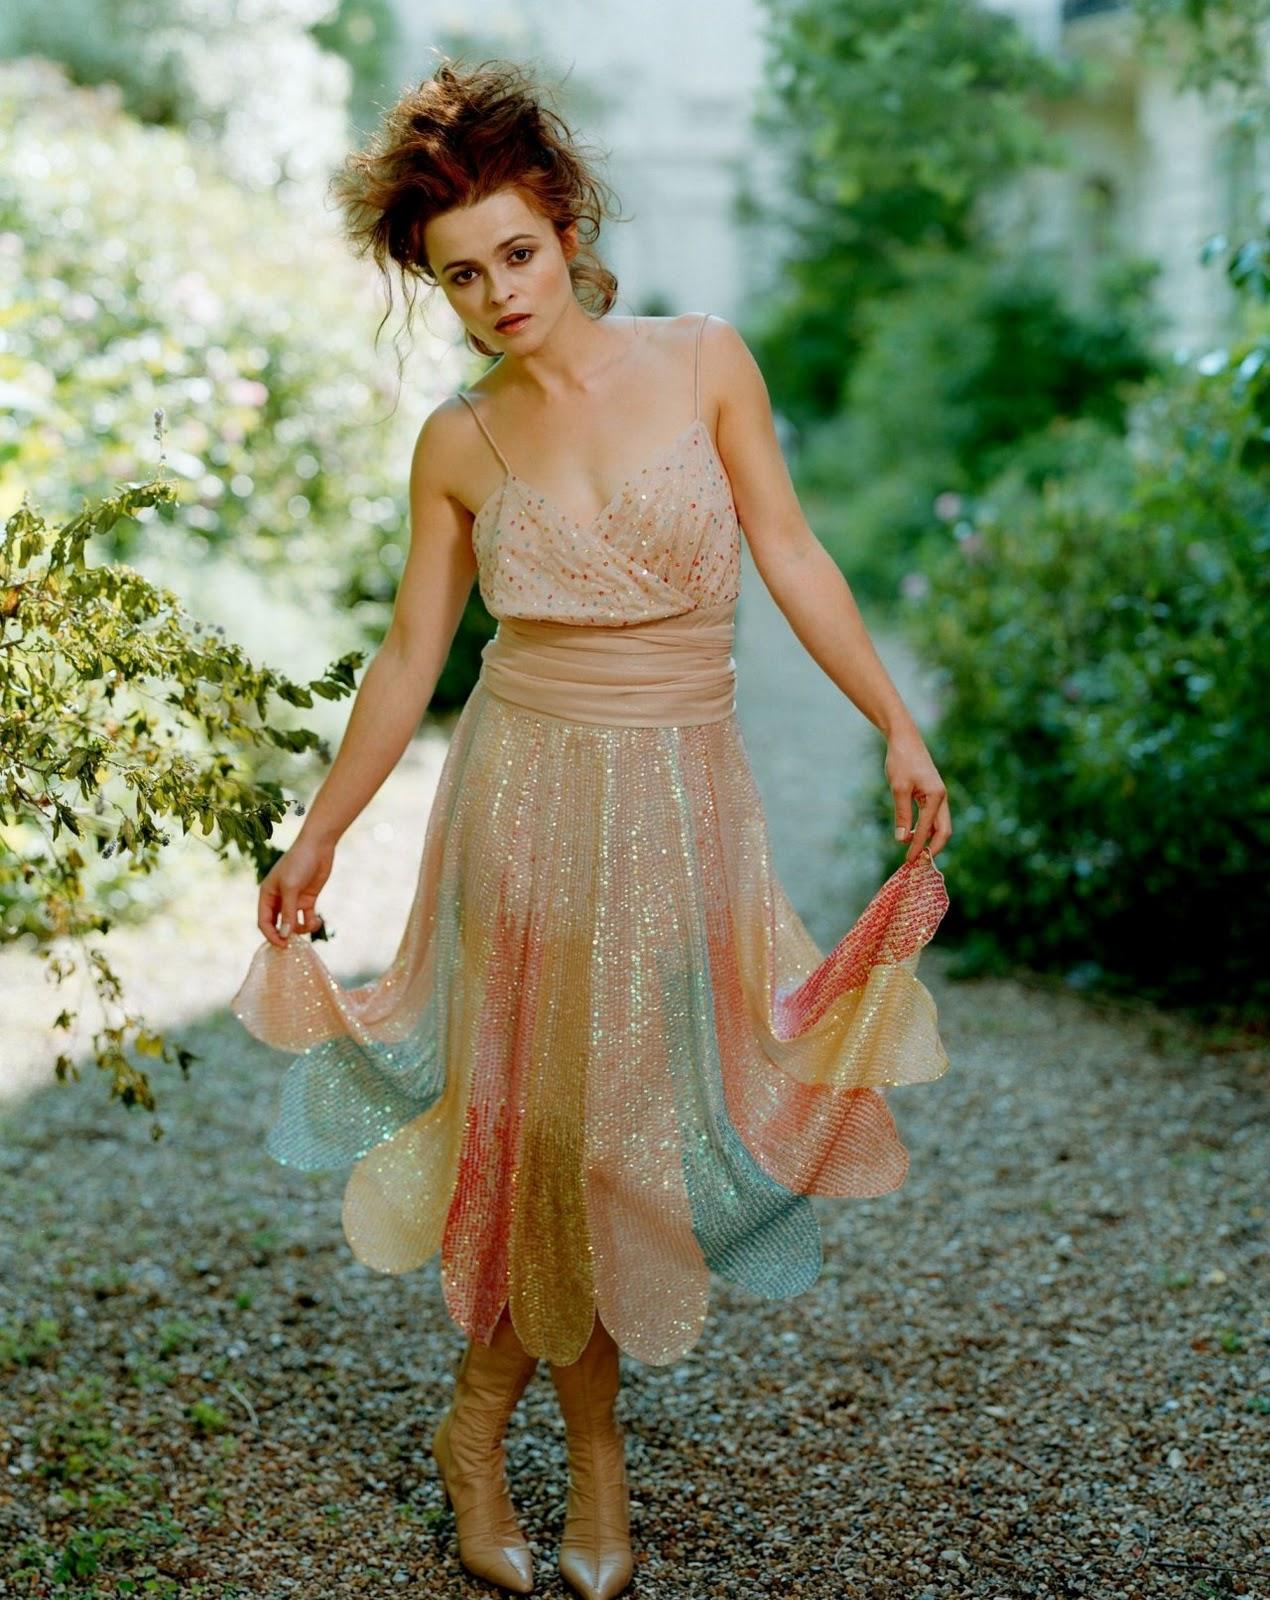 Style Icon: Helena Bonham Carter